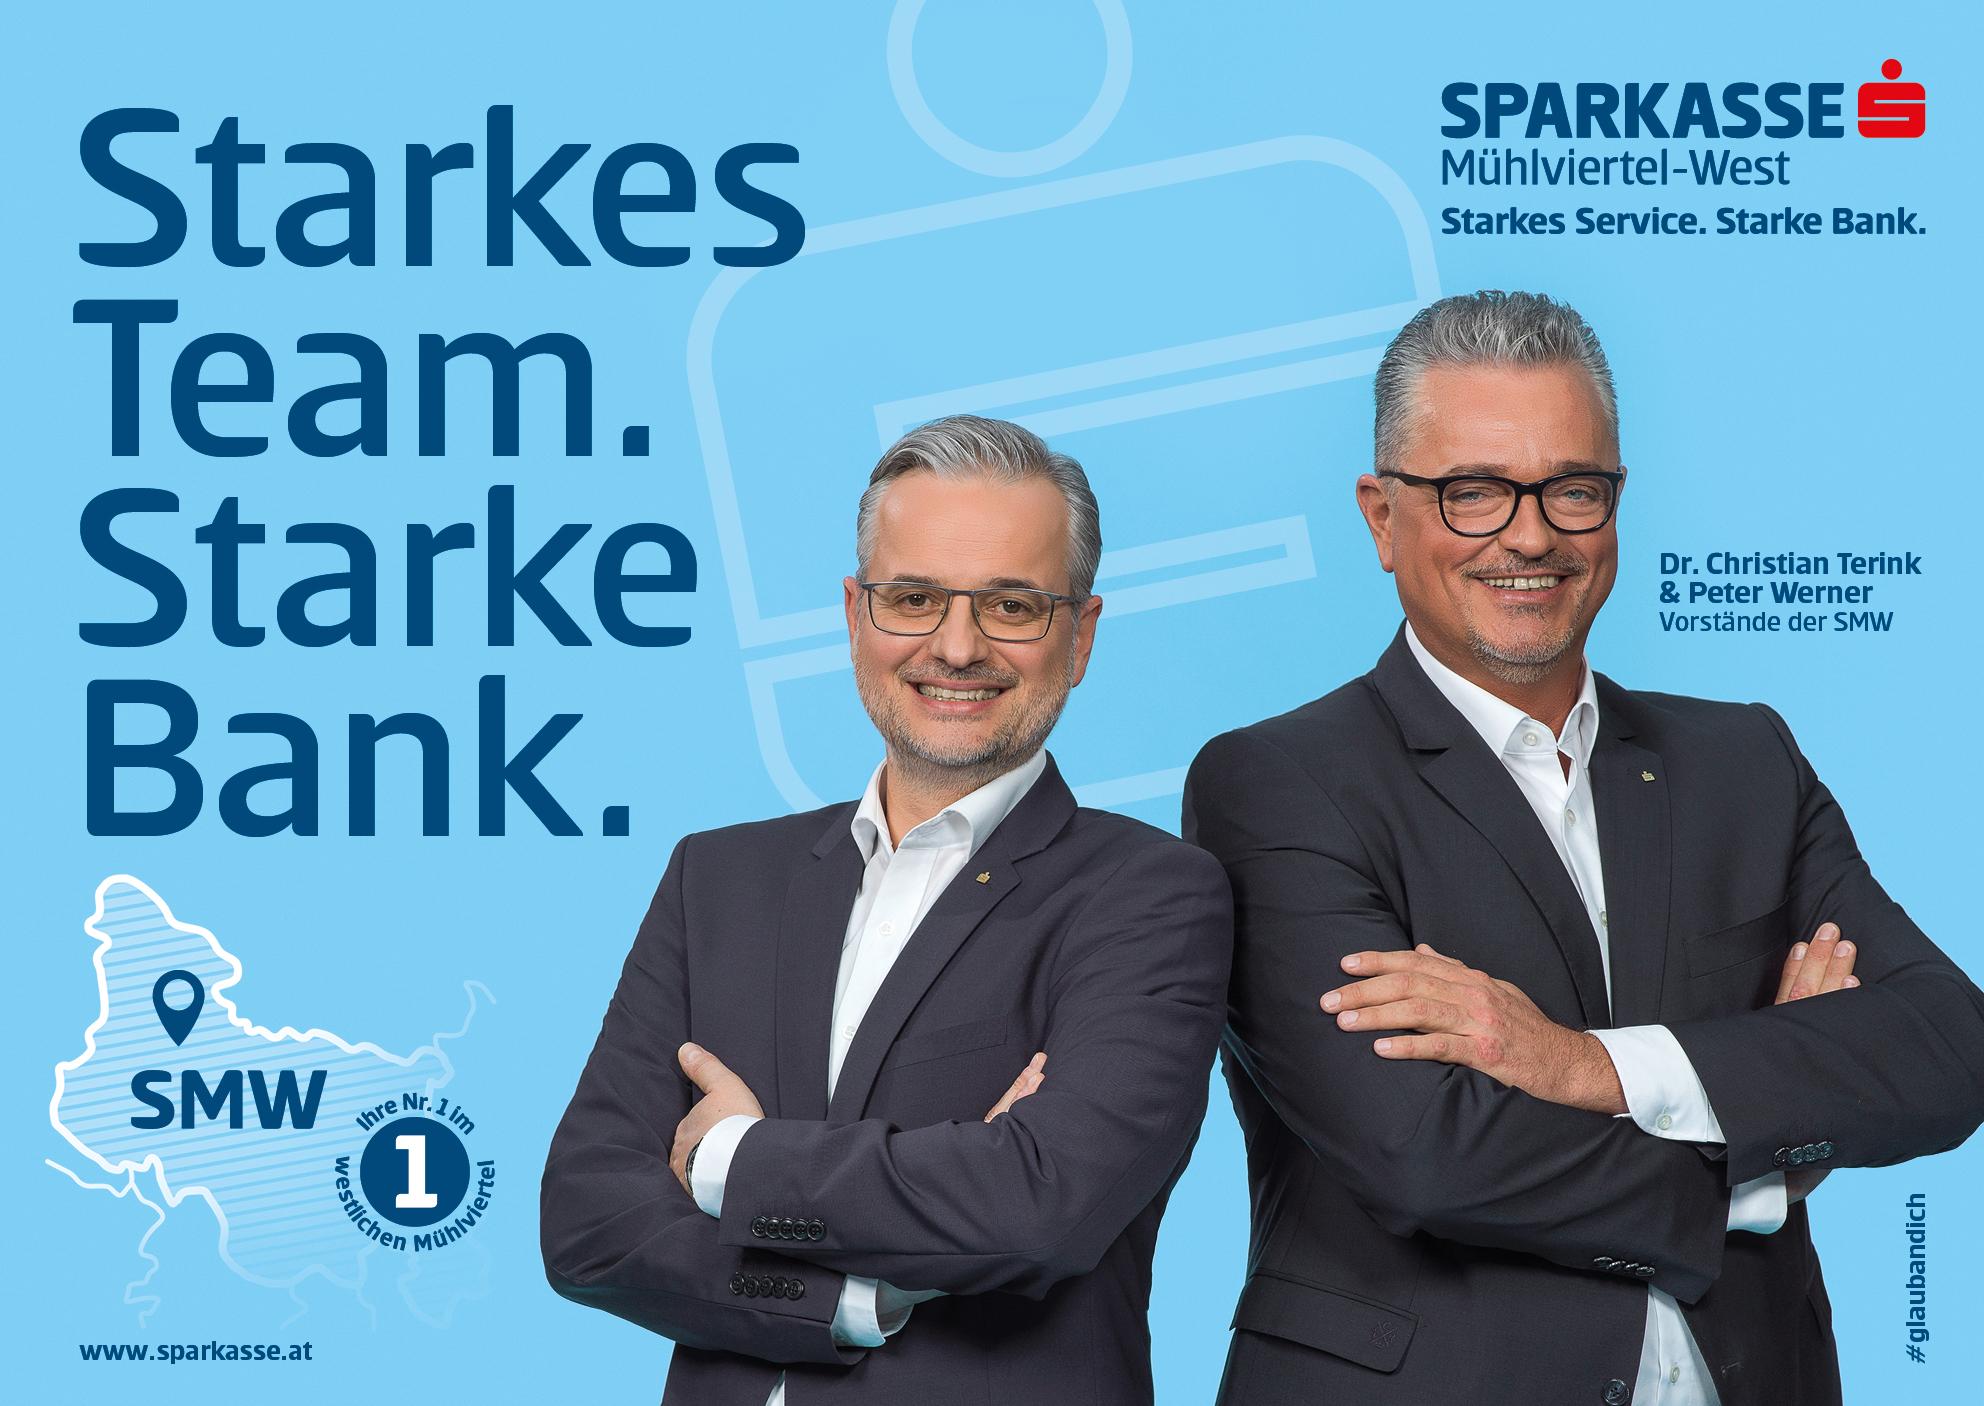 SPAR-D21007_16_Bogen_Plakat